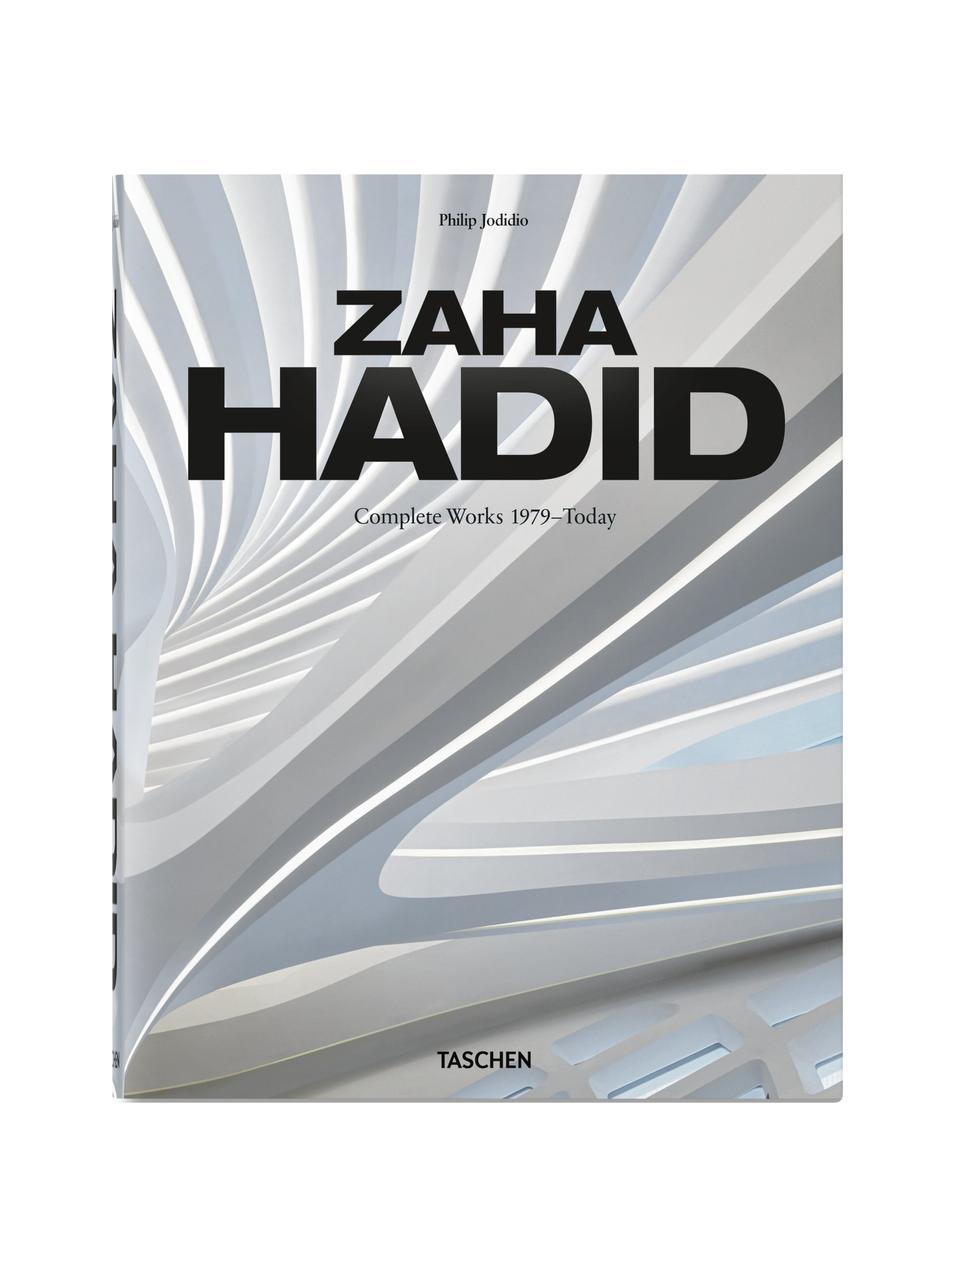 Bildband Zaha Hadid. Complete Works. 1979 - today, Papier, Hardcover, Grau, Mehrfarbig, 23 x 29 cm